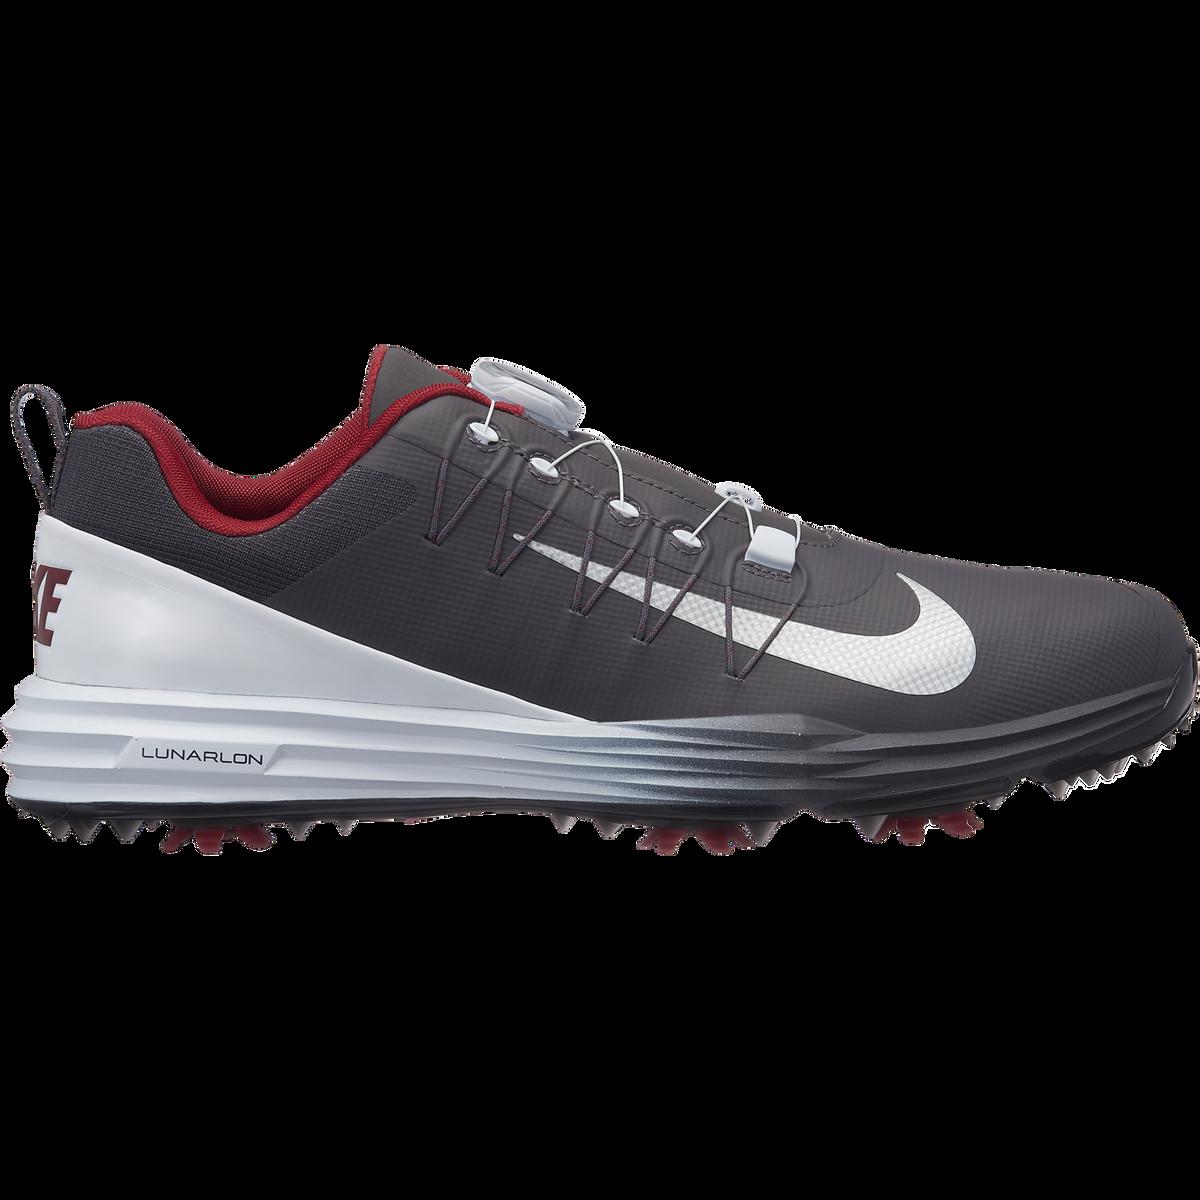 best loved dc7c3 0fdc9 Nike Lunar Command 2 BOA Men's Golf Shoe - Grey/White Zoom Image